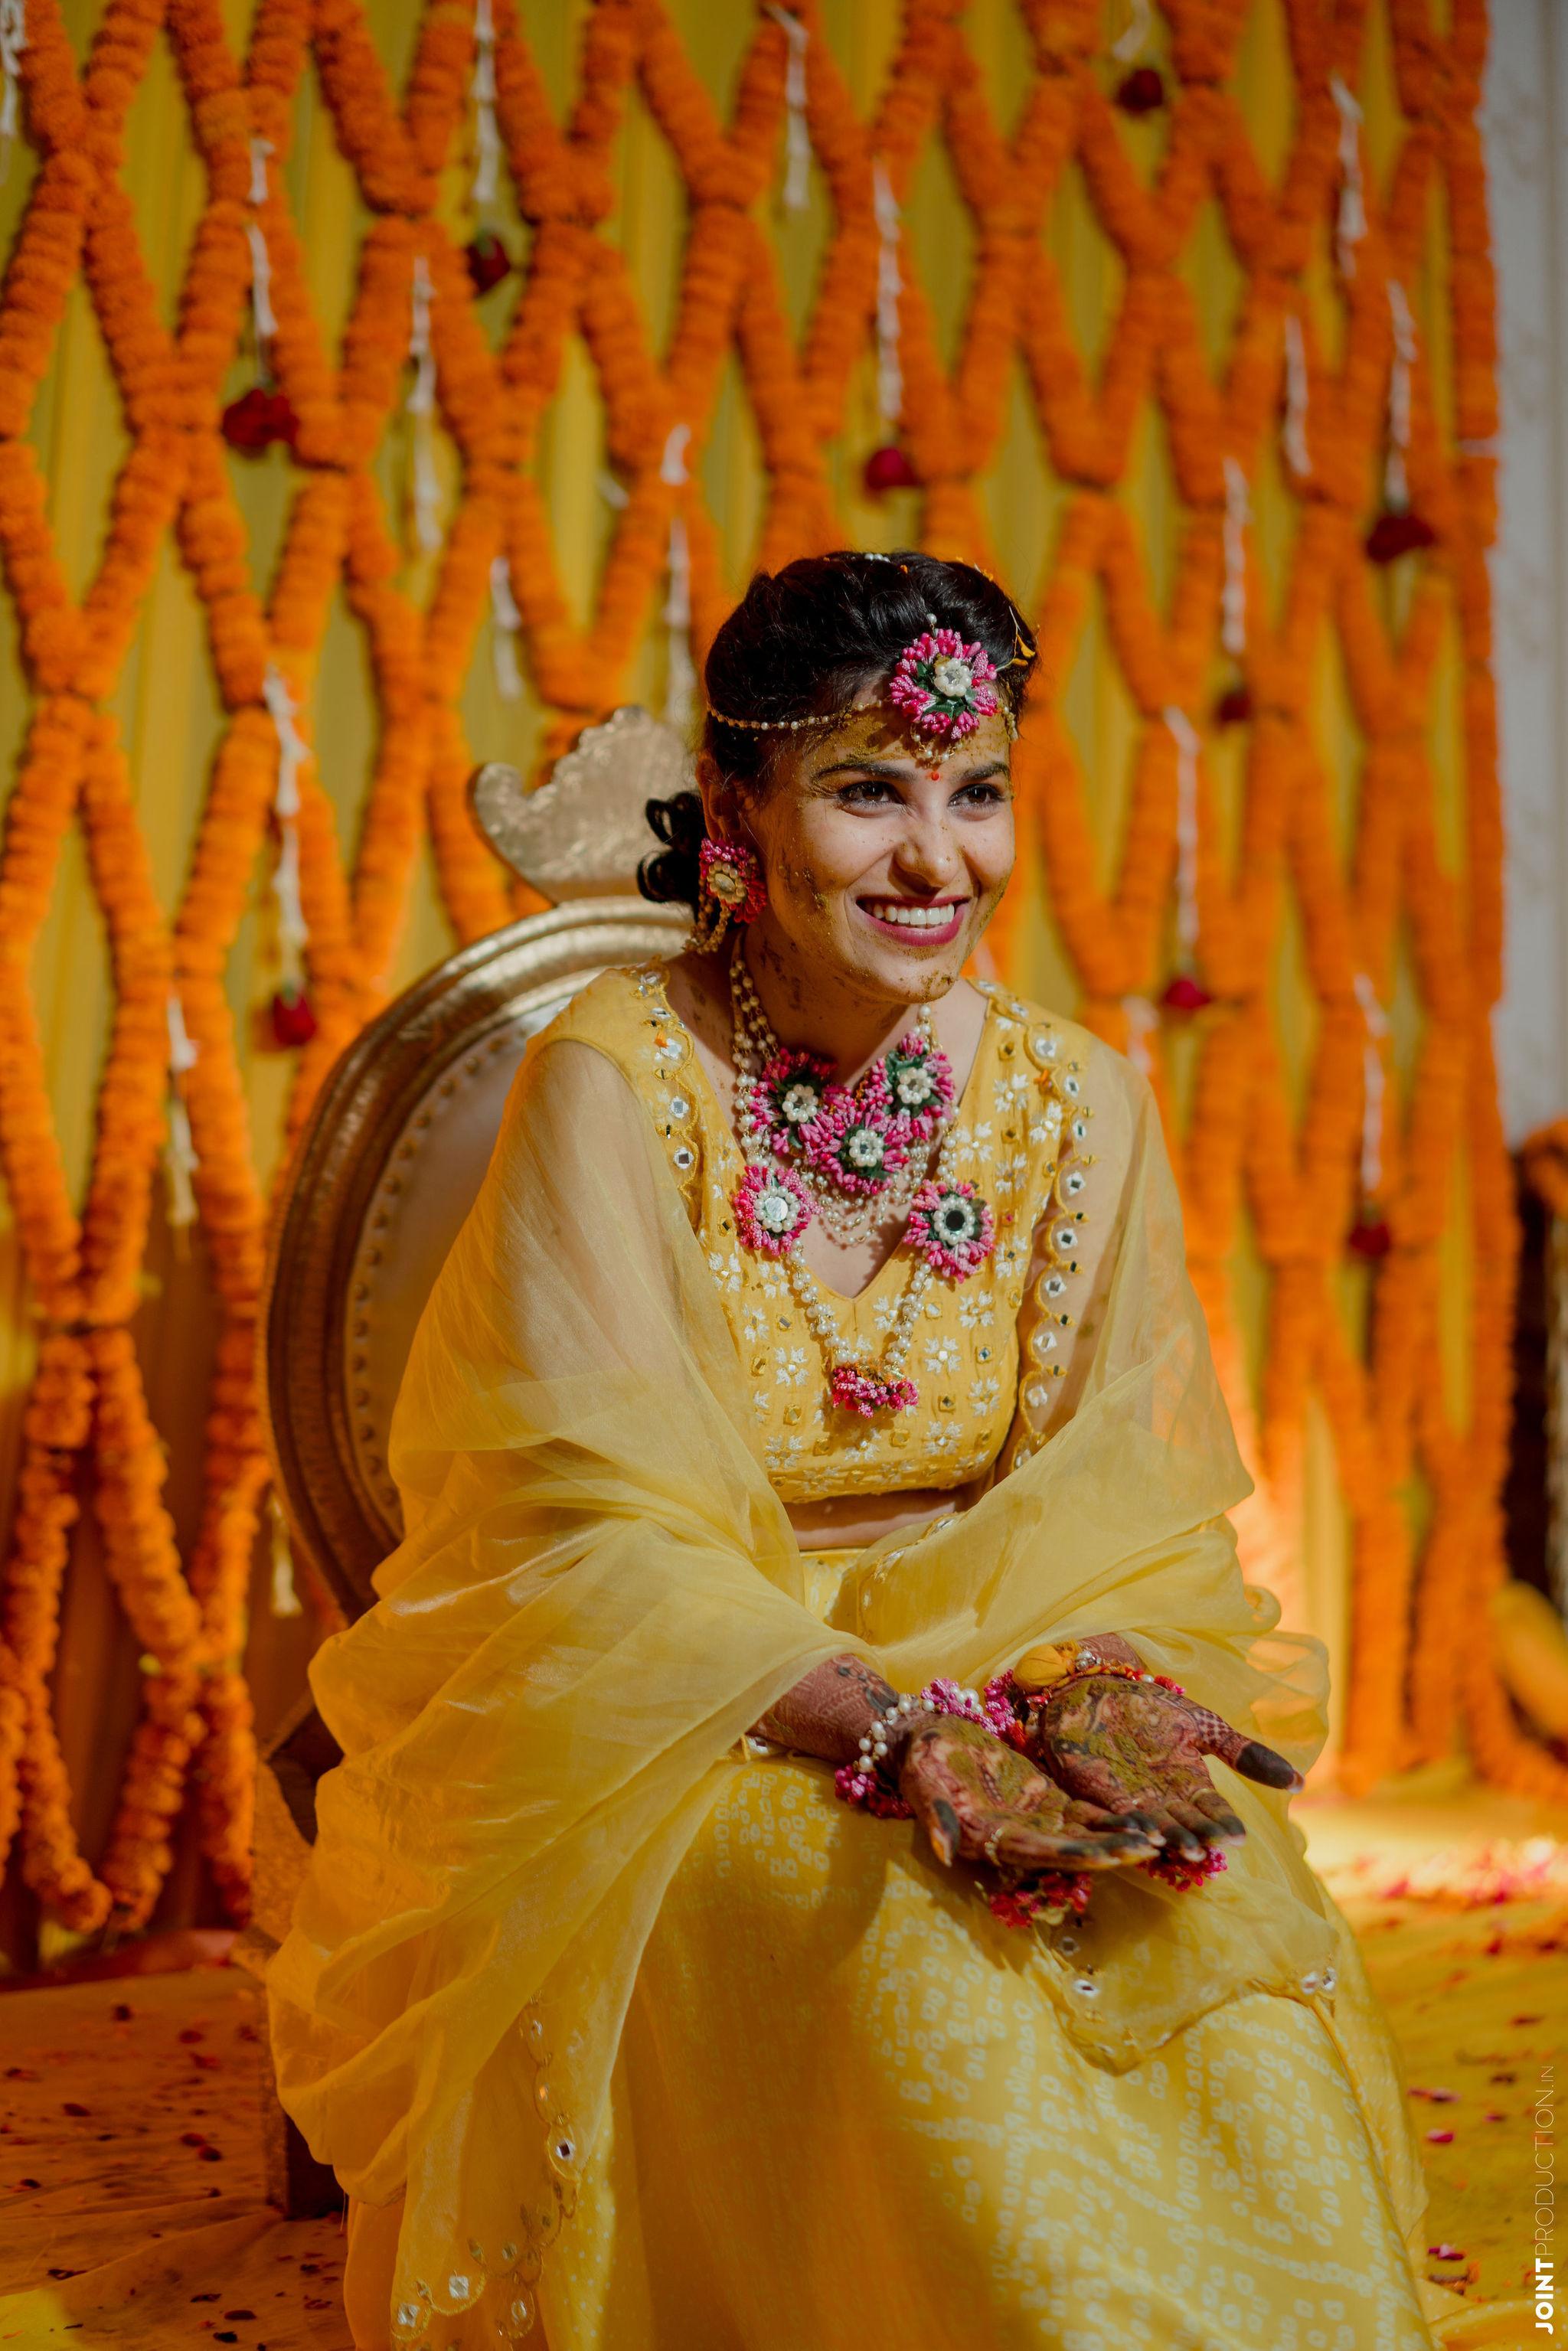 pink floral jewellery and yellow lehenga for haldi